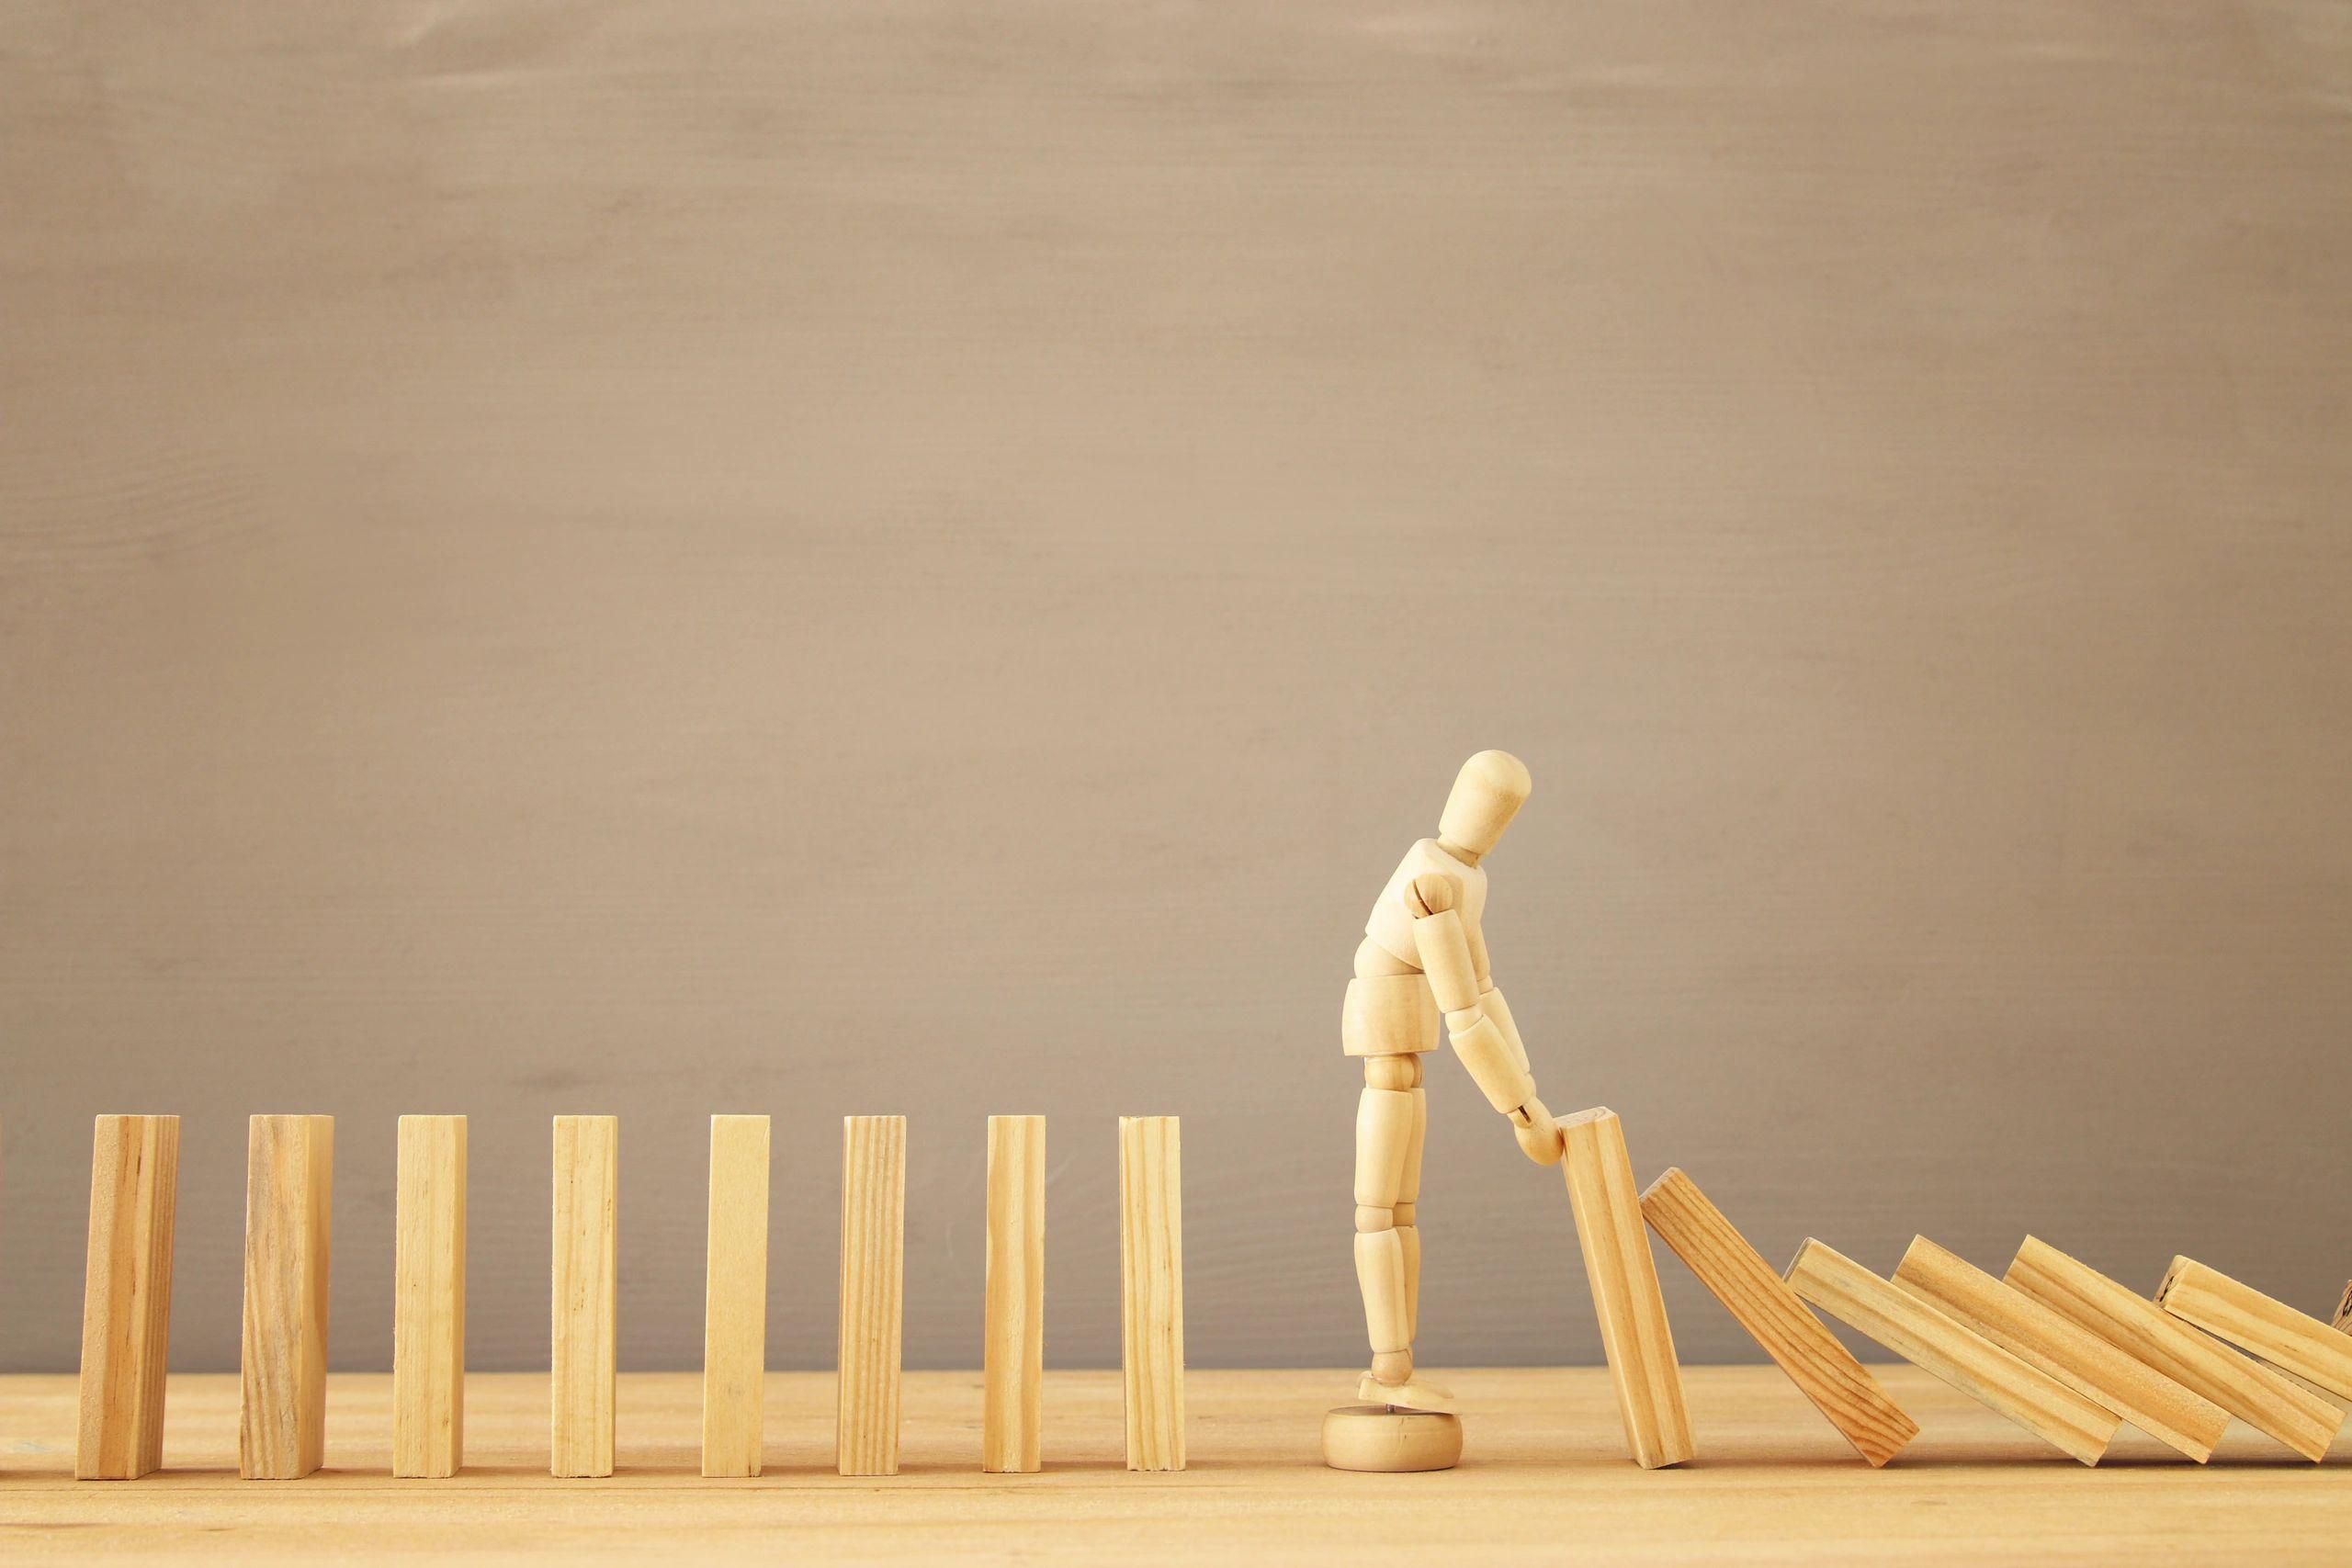 Is De-Implementation the Best Way to Build Back Better?